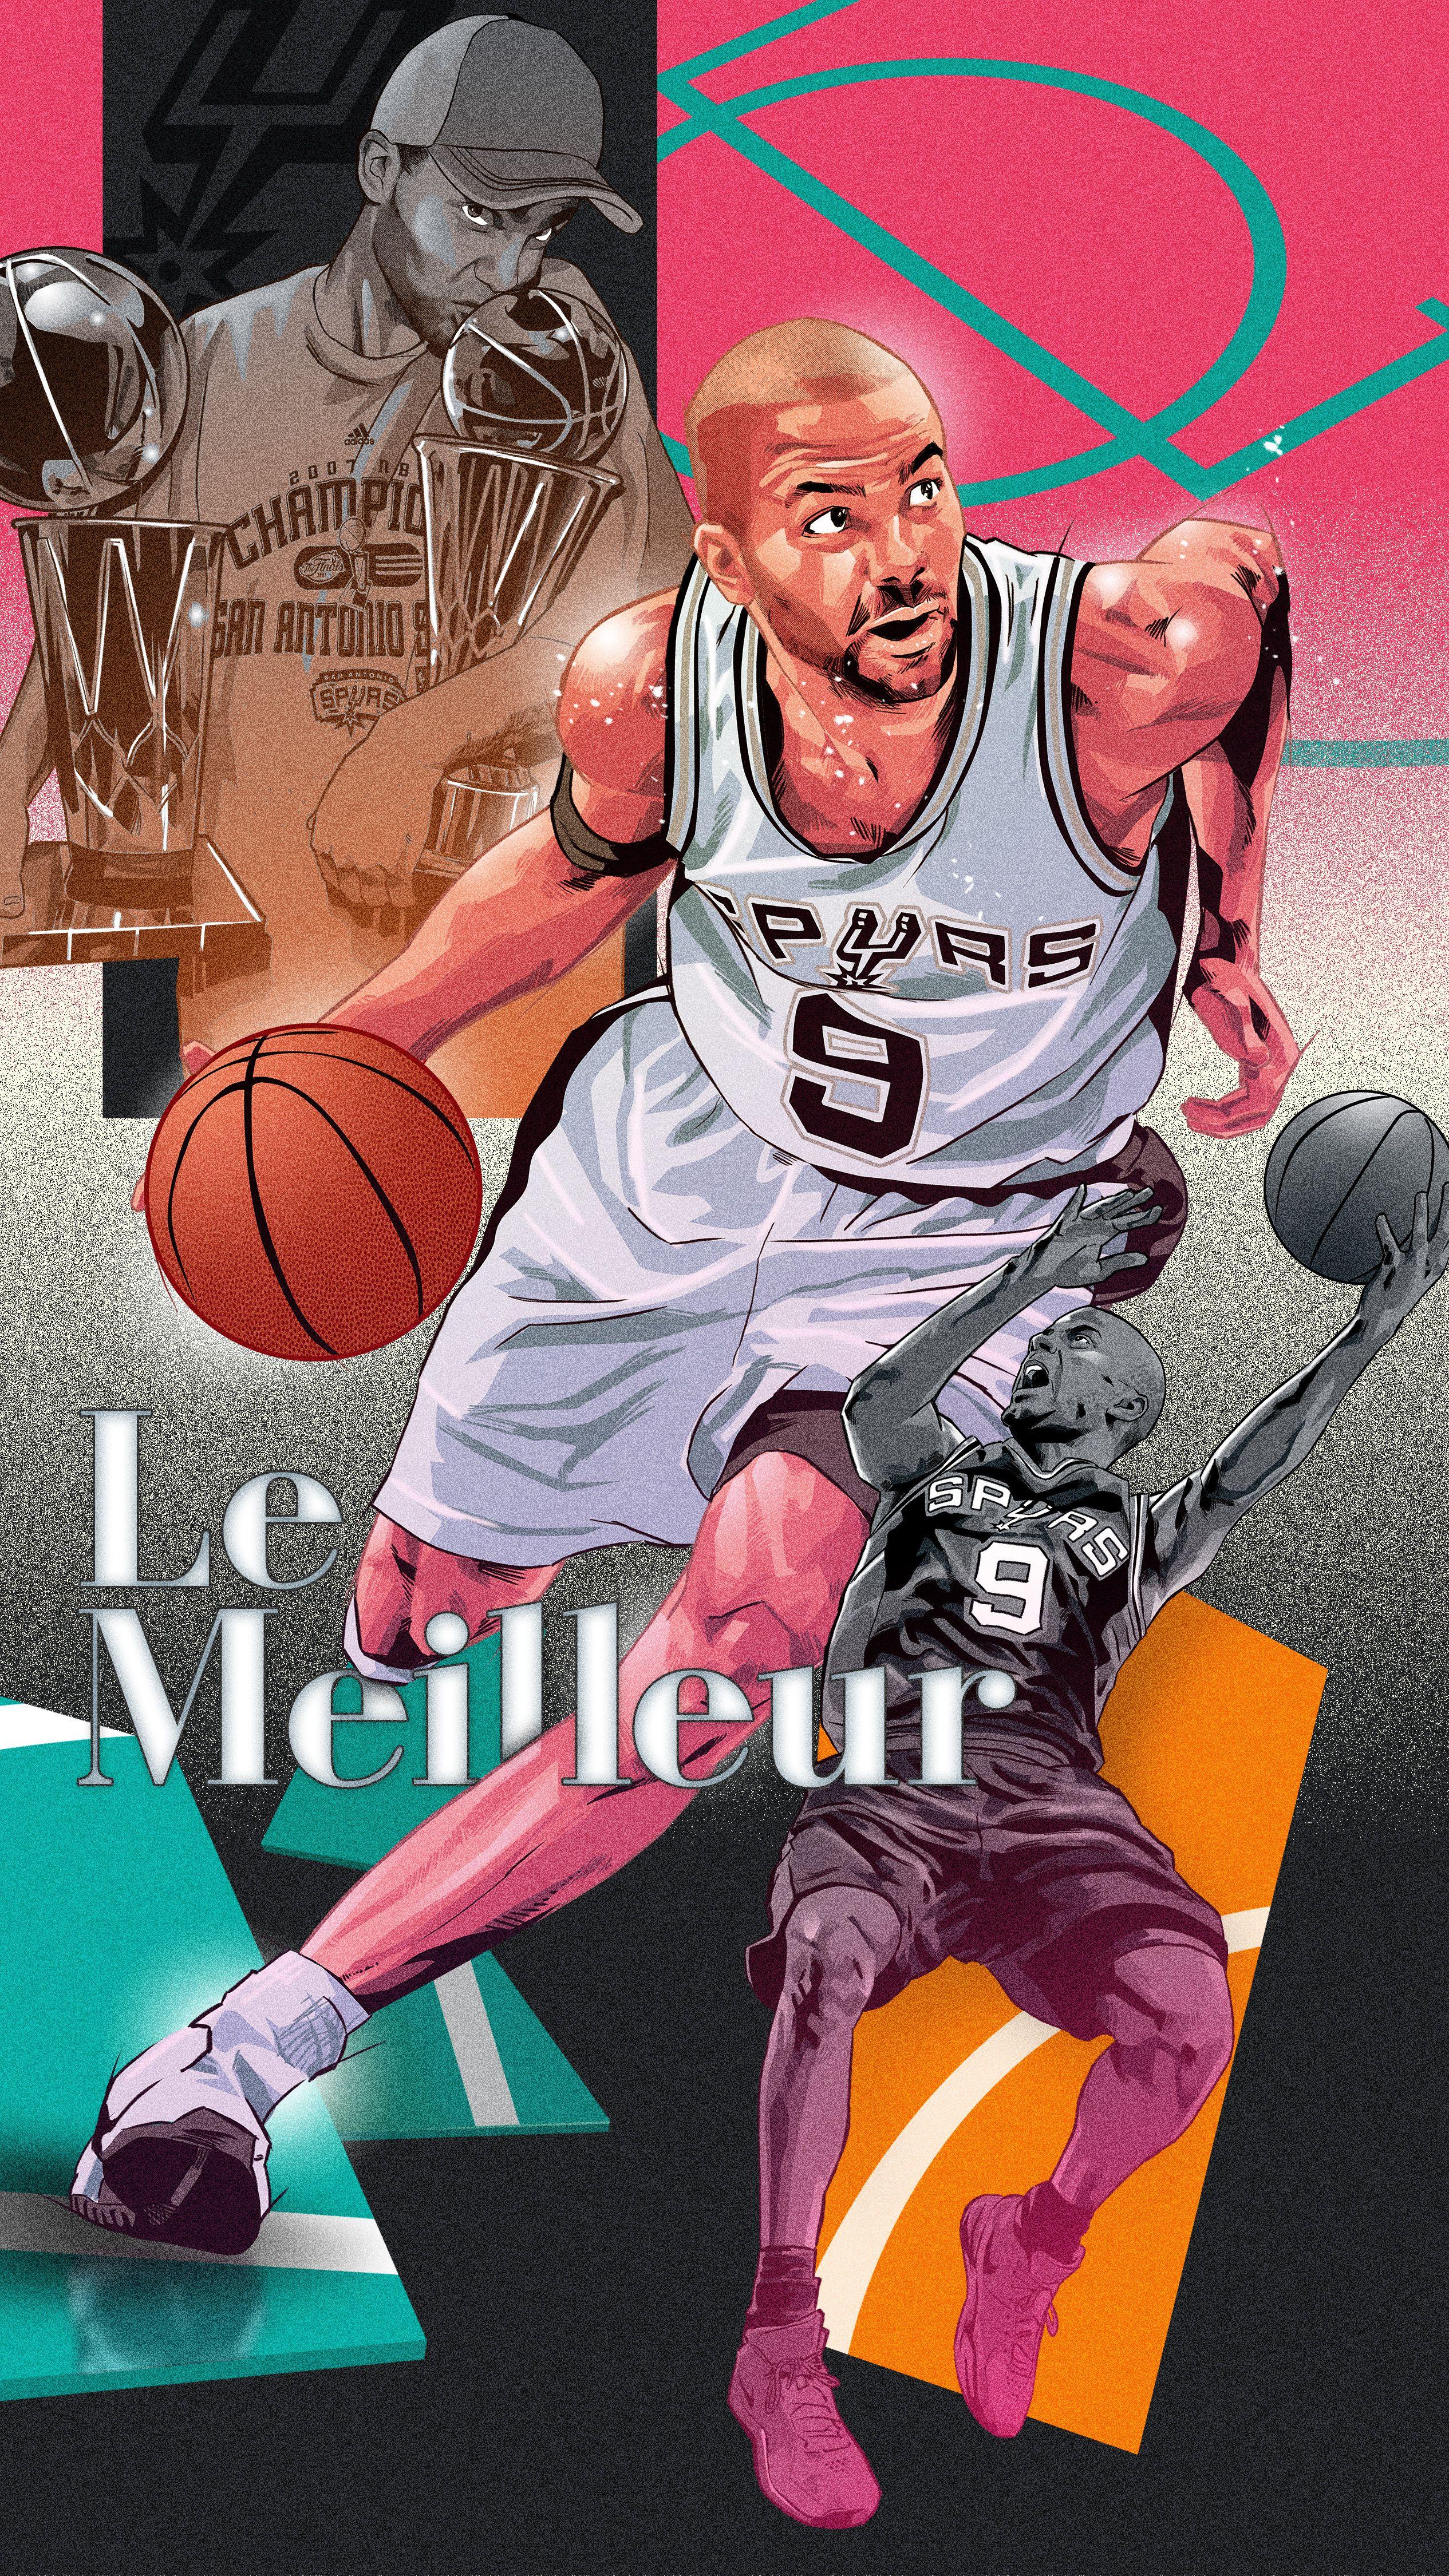 Download Pin By Jalen Jones On Giannis Antetokounmpo Thegreekfreak Nba For Hd Quality Basketball 4ksporttv C In 2020 Nba Basketball Art San Antonio Spurs Tony Parker